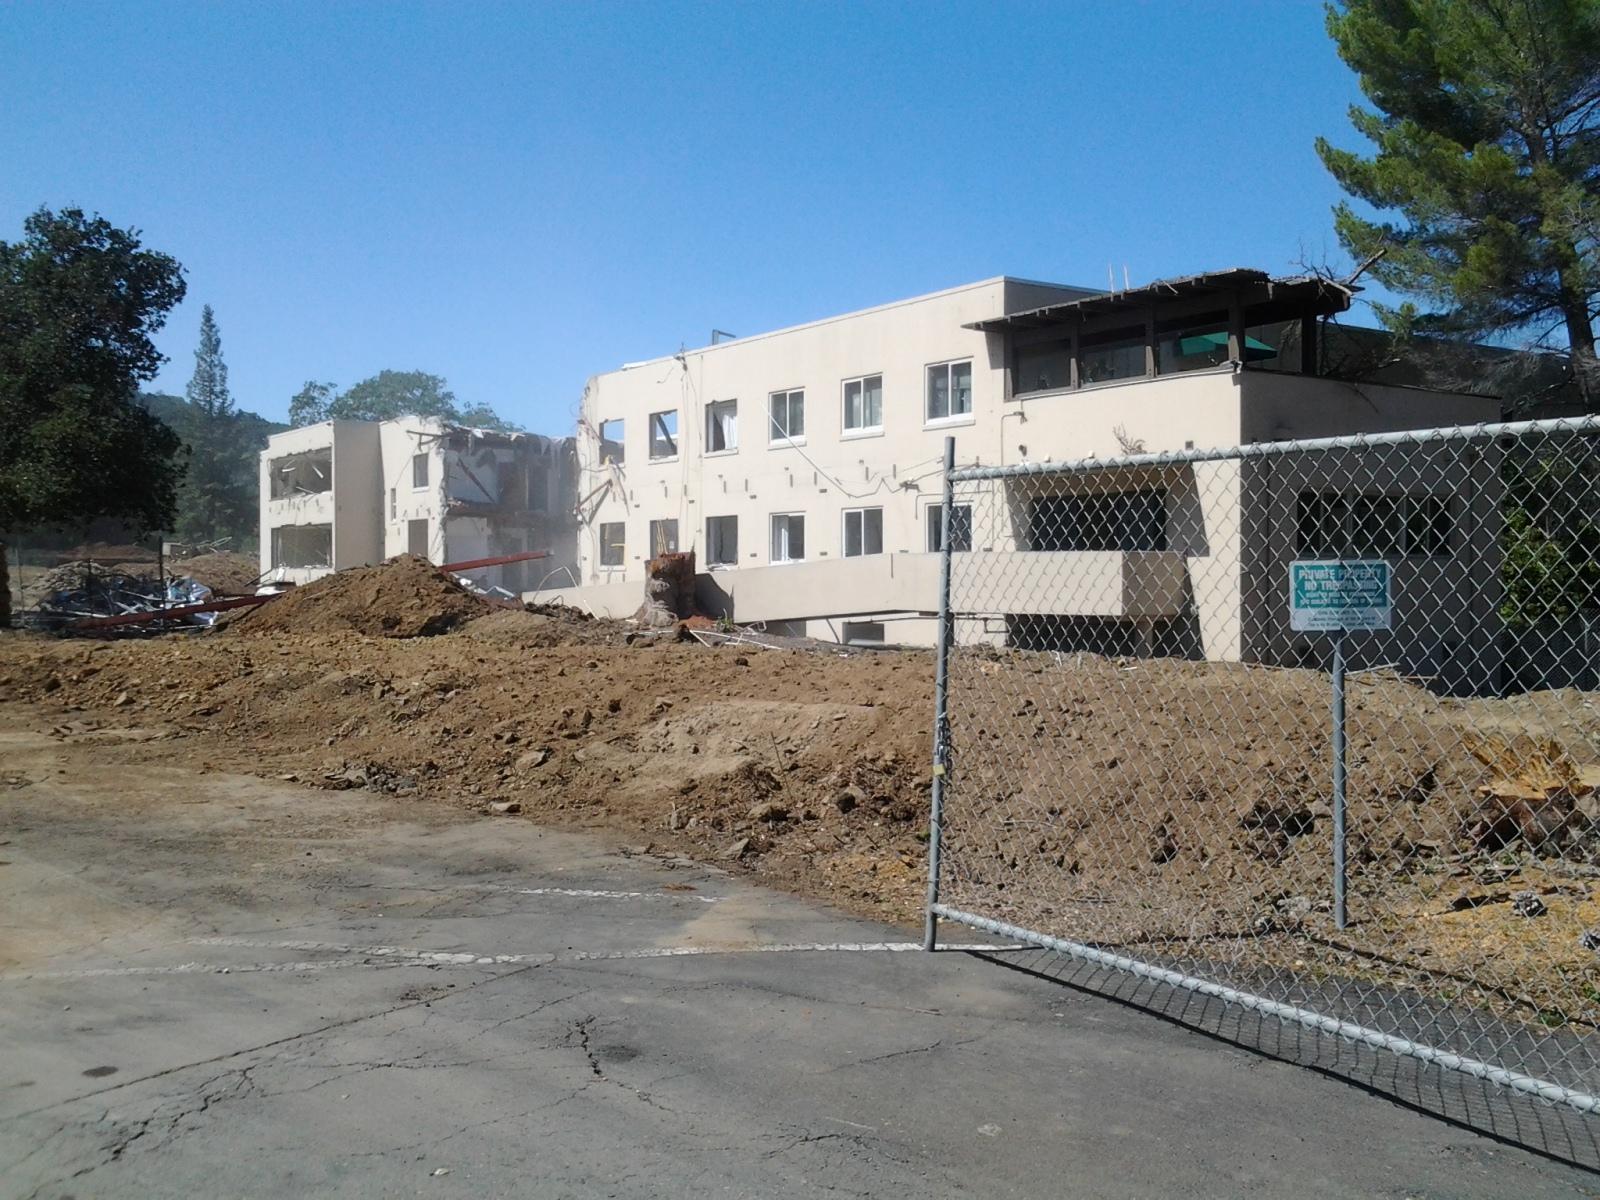 3 convent - Convent tear down